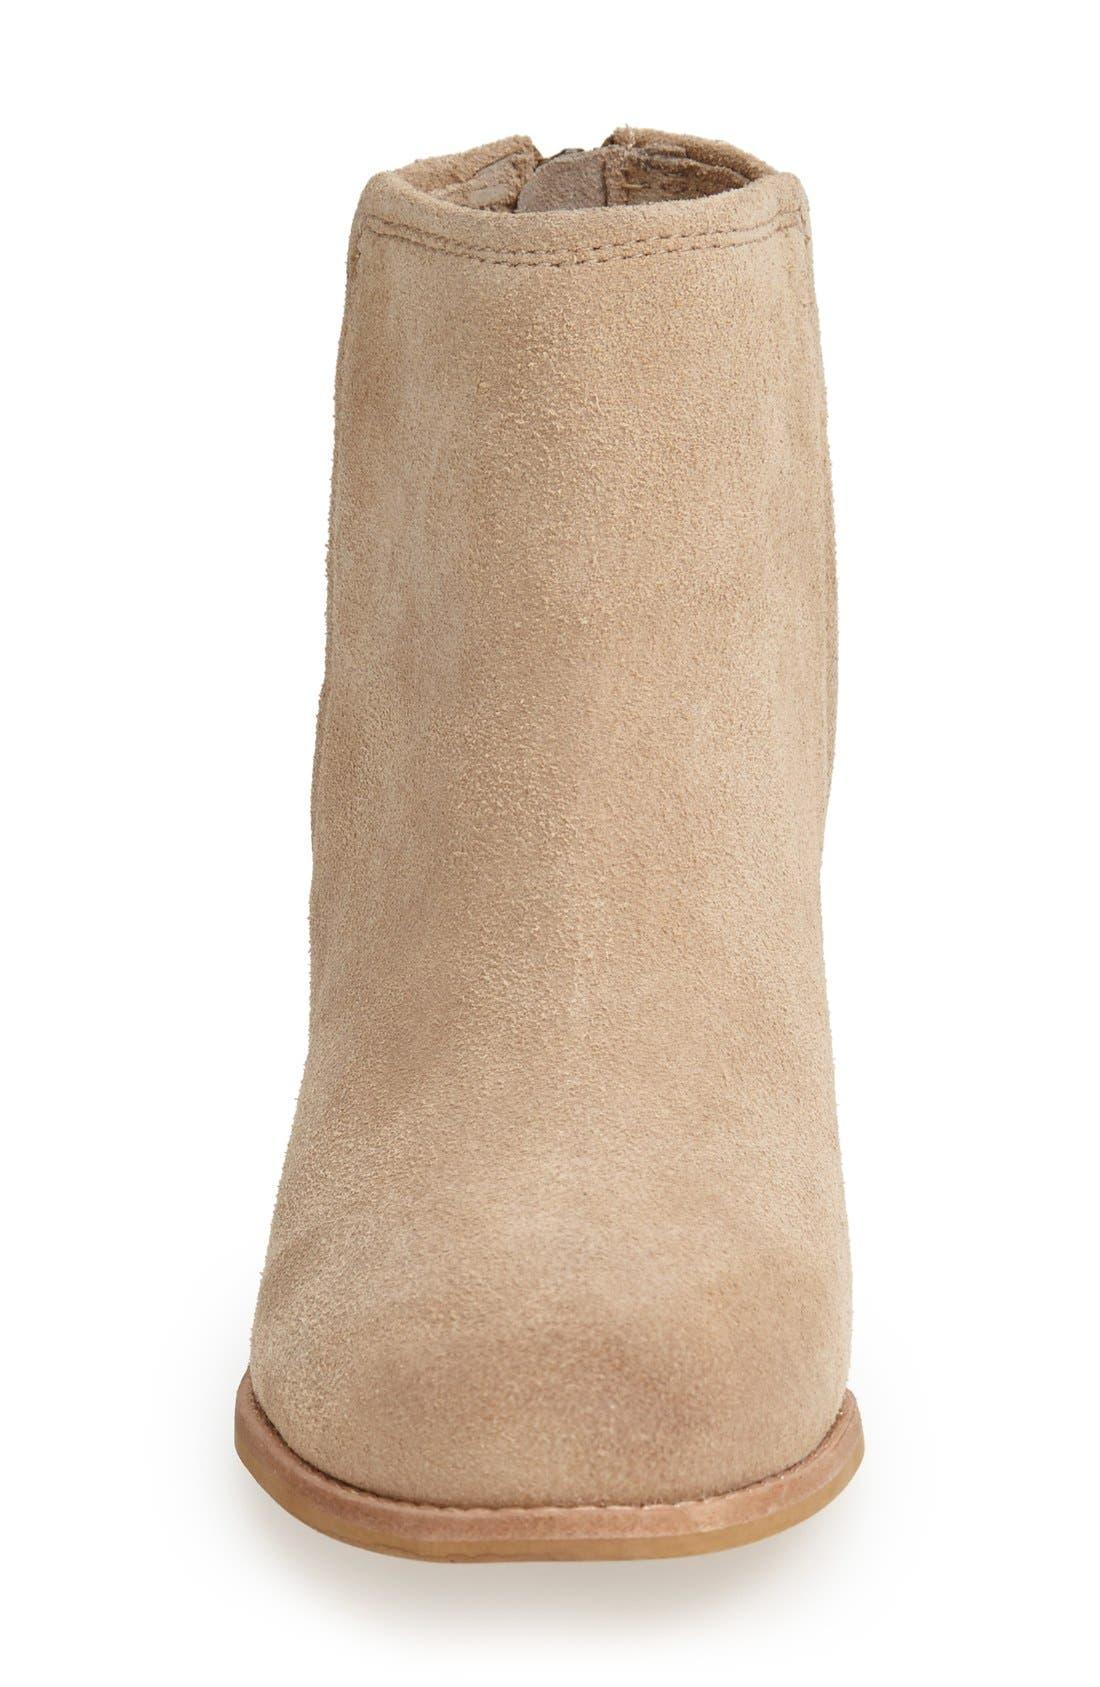 Alternate Image 3  - Splendid 'Roland' Suede Ankle Bootie (Women)